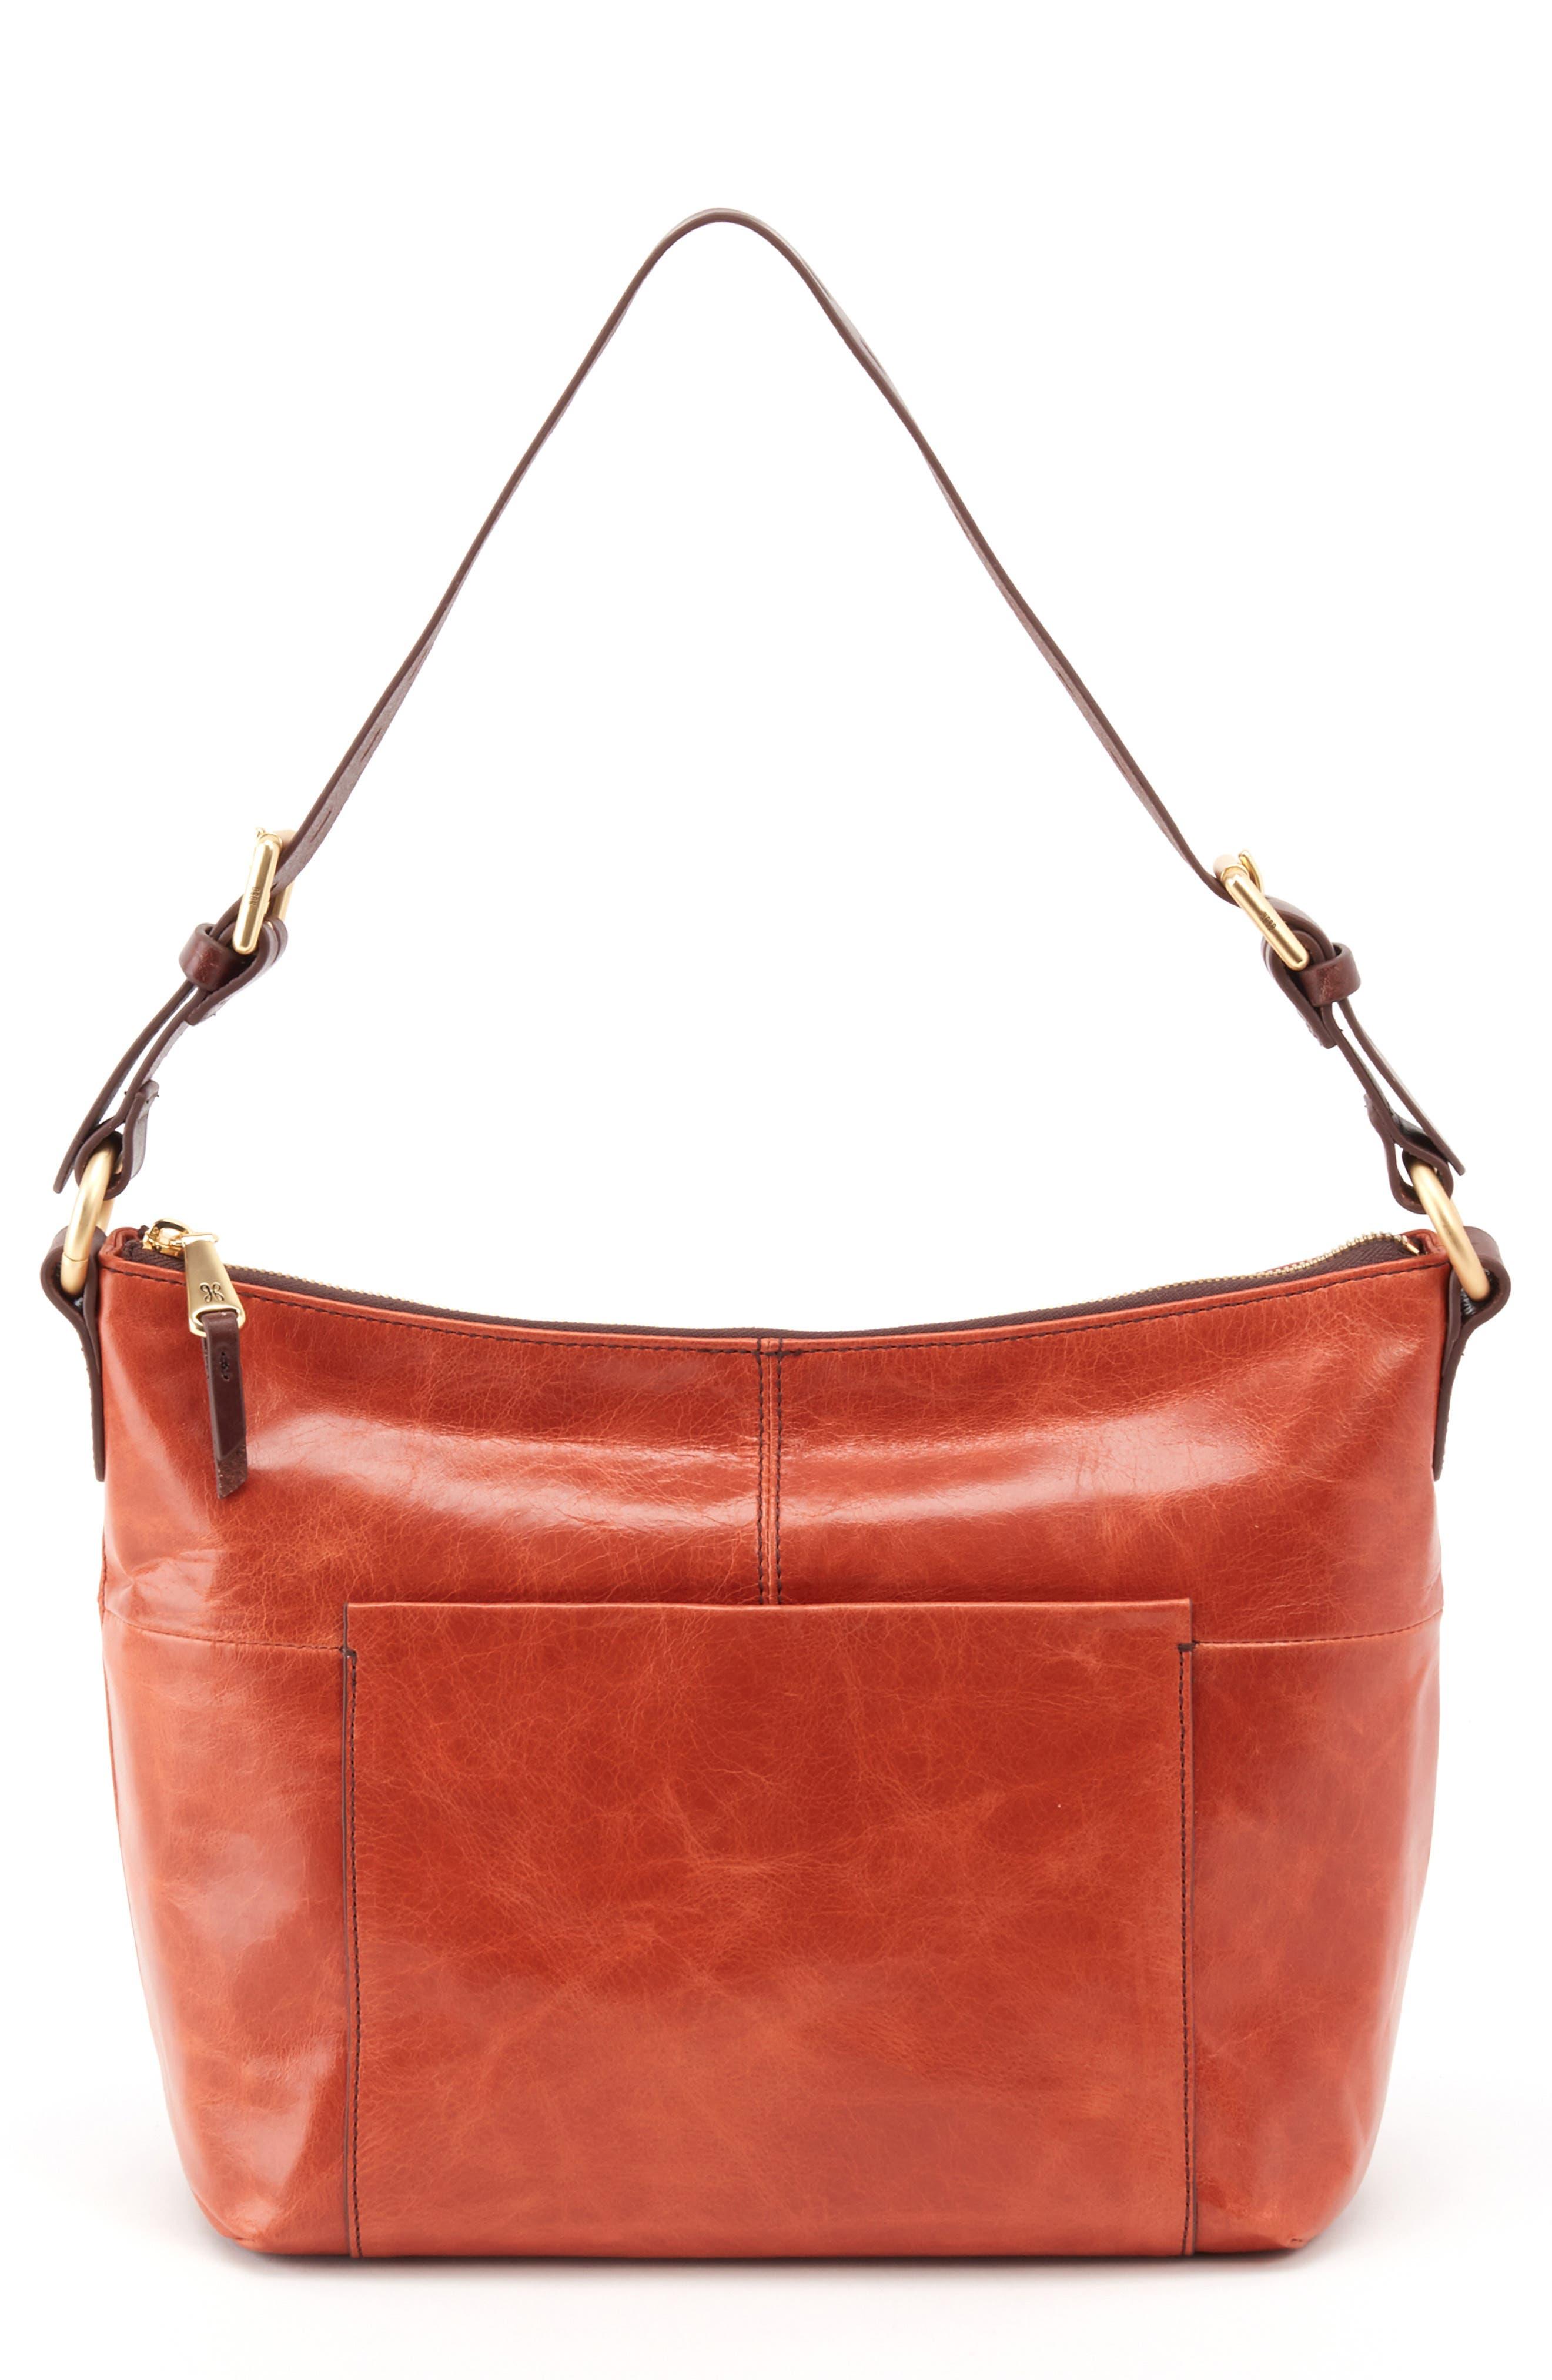 'Charlie' Leather Shoulder Bag,                             Main thumbnail 1, color,                             Clay